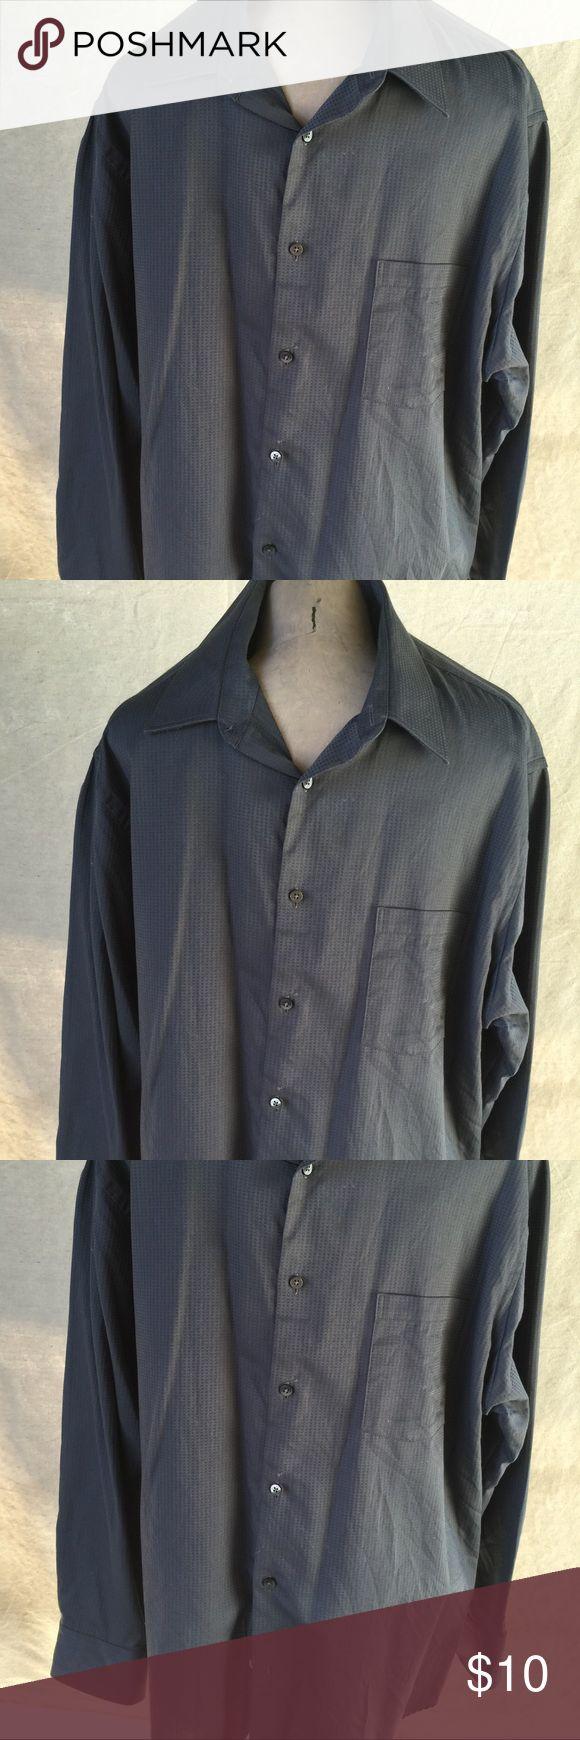 Geoffrey Beene Men's Gray Dress Shirt Geoffrey Beene Men's Charcoal Gray Dress Shirt Size Large Geoffrey Beene Shirts Dress Shirts